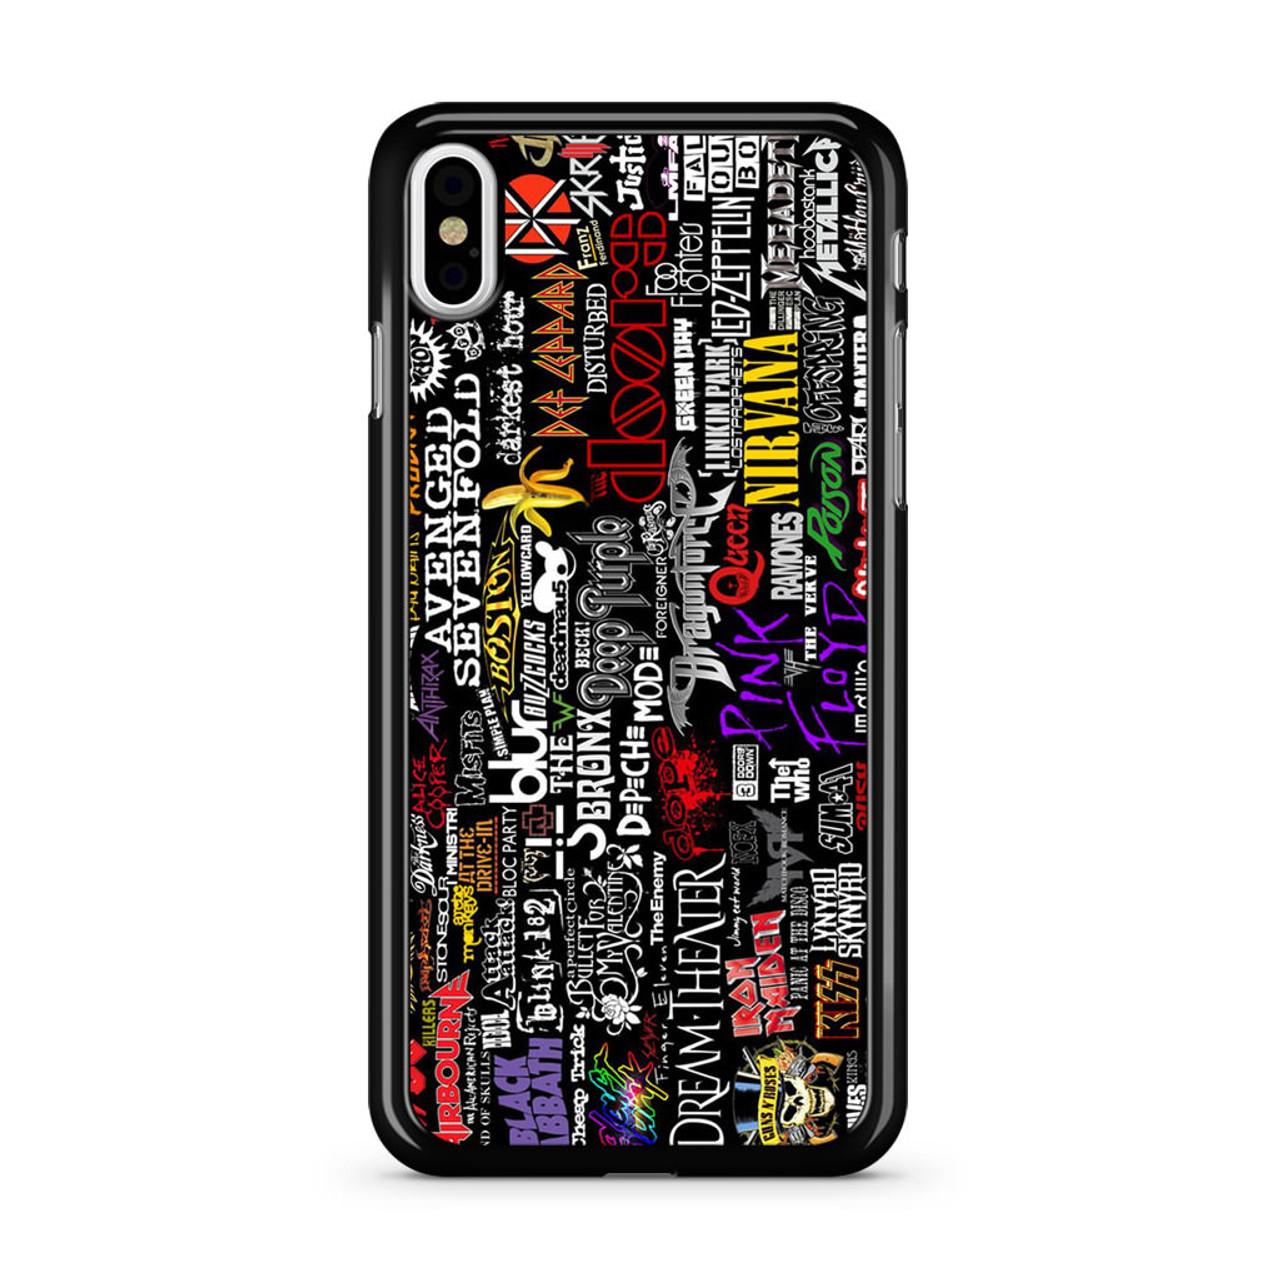 iphone xs case music